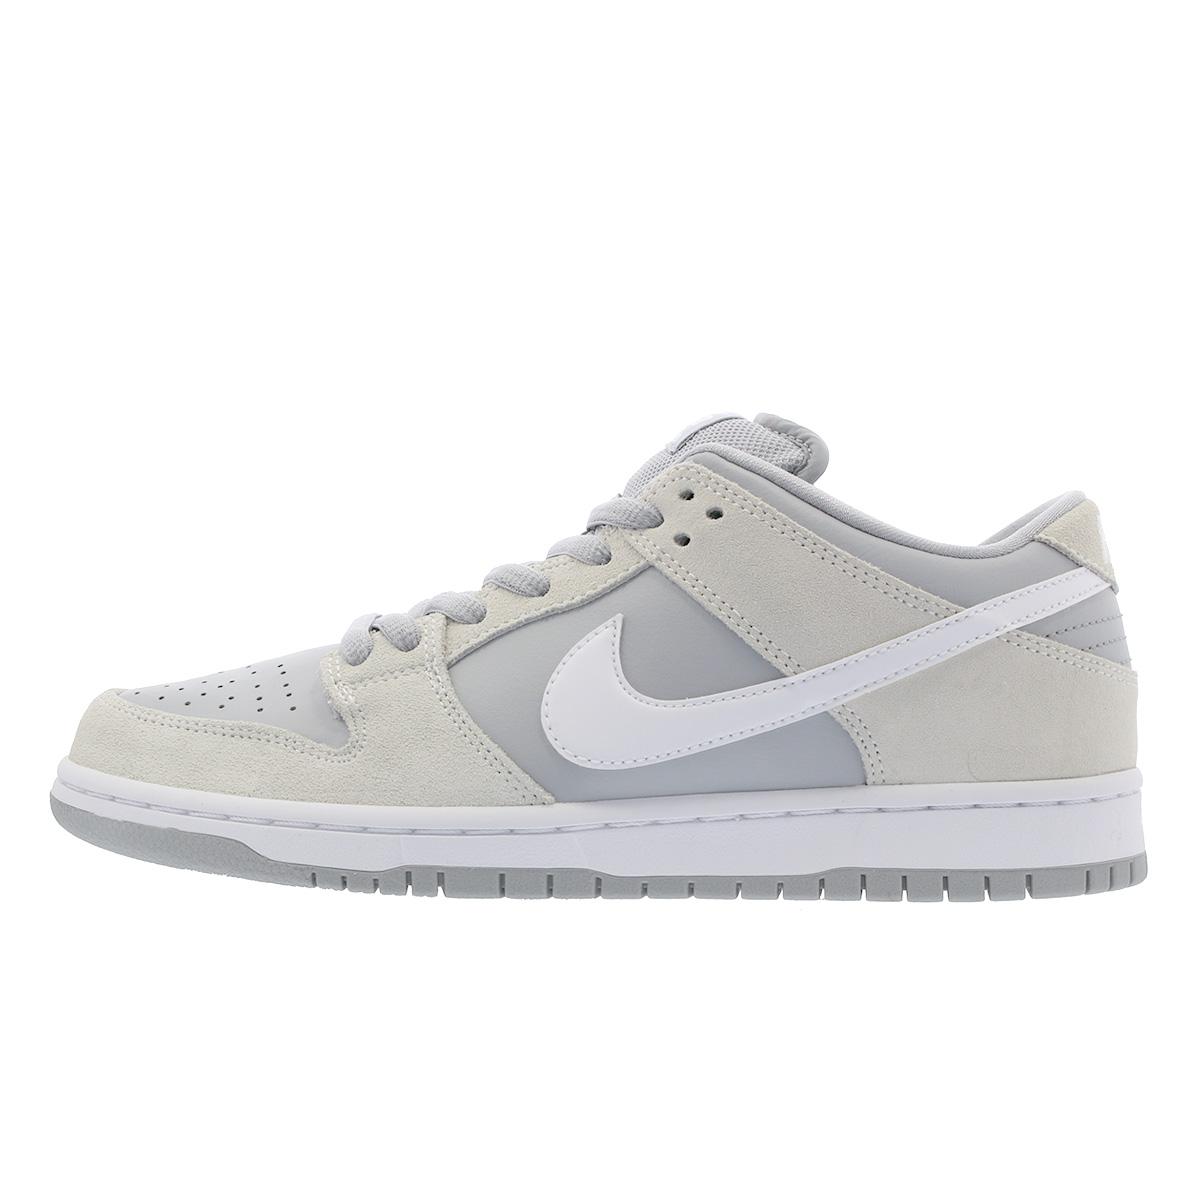 best sneakers 53218 8d4cb NIKE SB DUNK LOW TRD Nike SB dunk low TRD SUMMIT WHITE WHITE WOLF GREY  ar0778-110